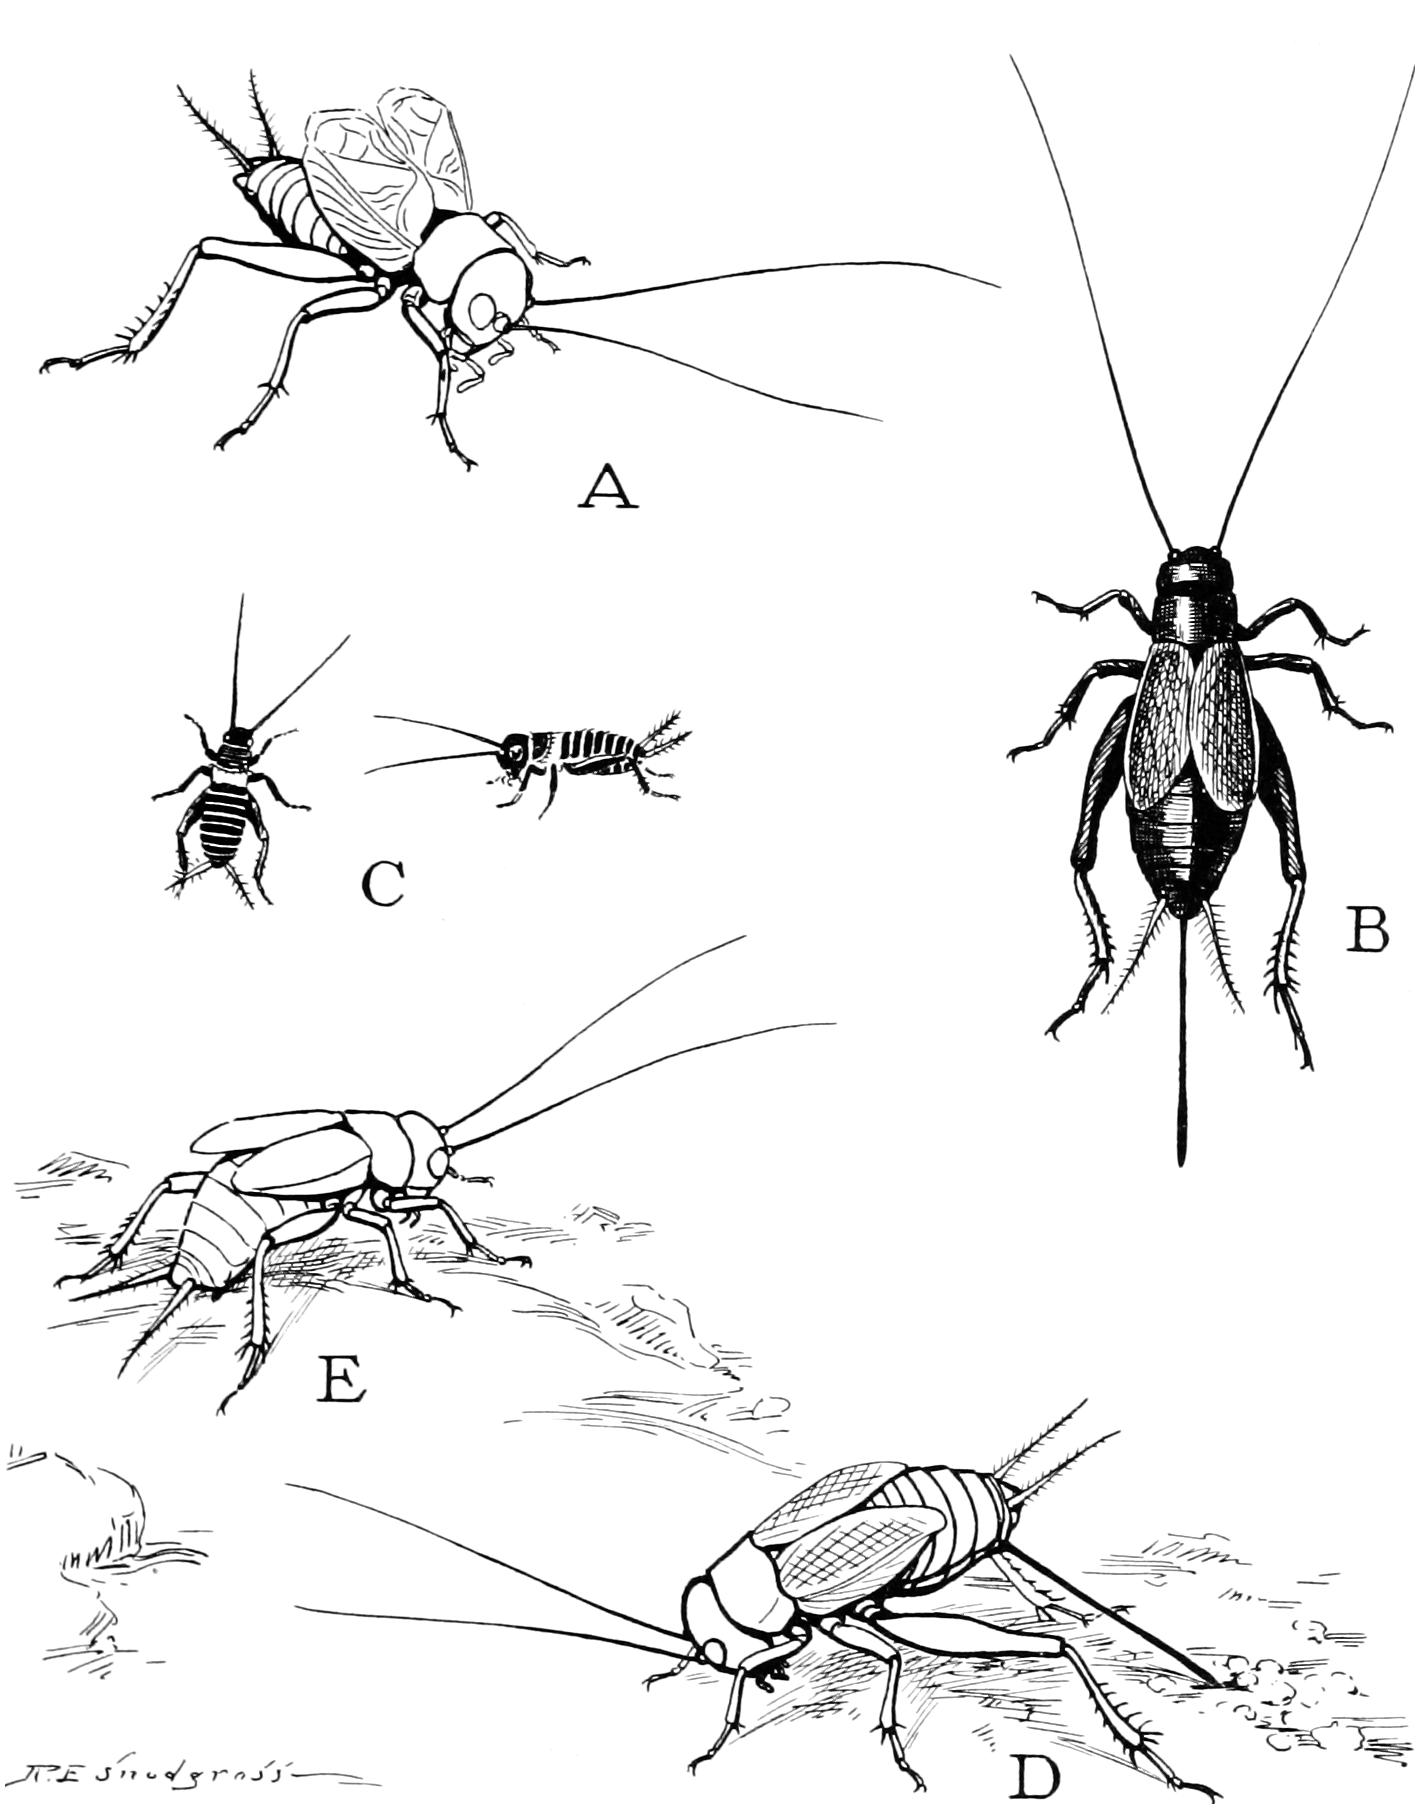 https://upload.wikimedia.org/wikipedia/commons/b/b7/Snodgrass_Gryllus_assimilis.png